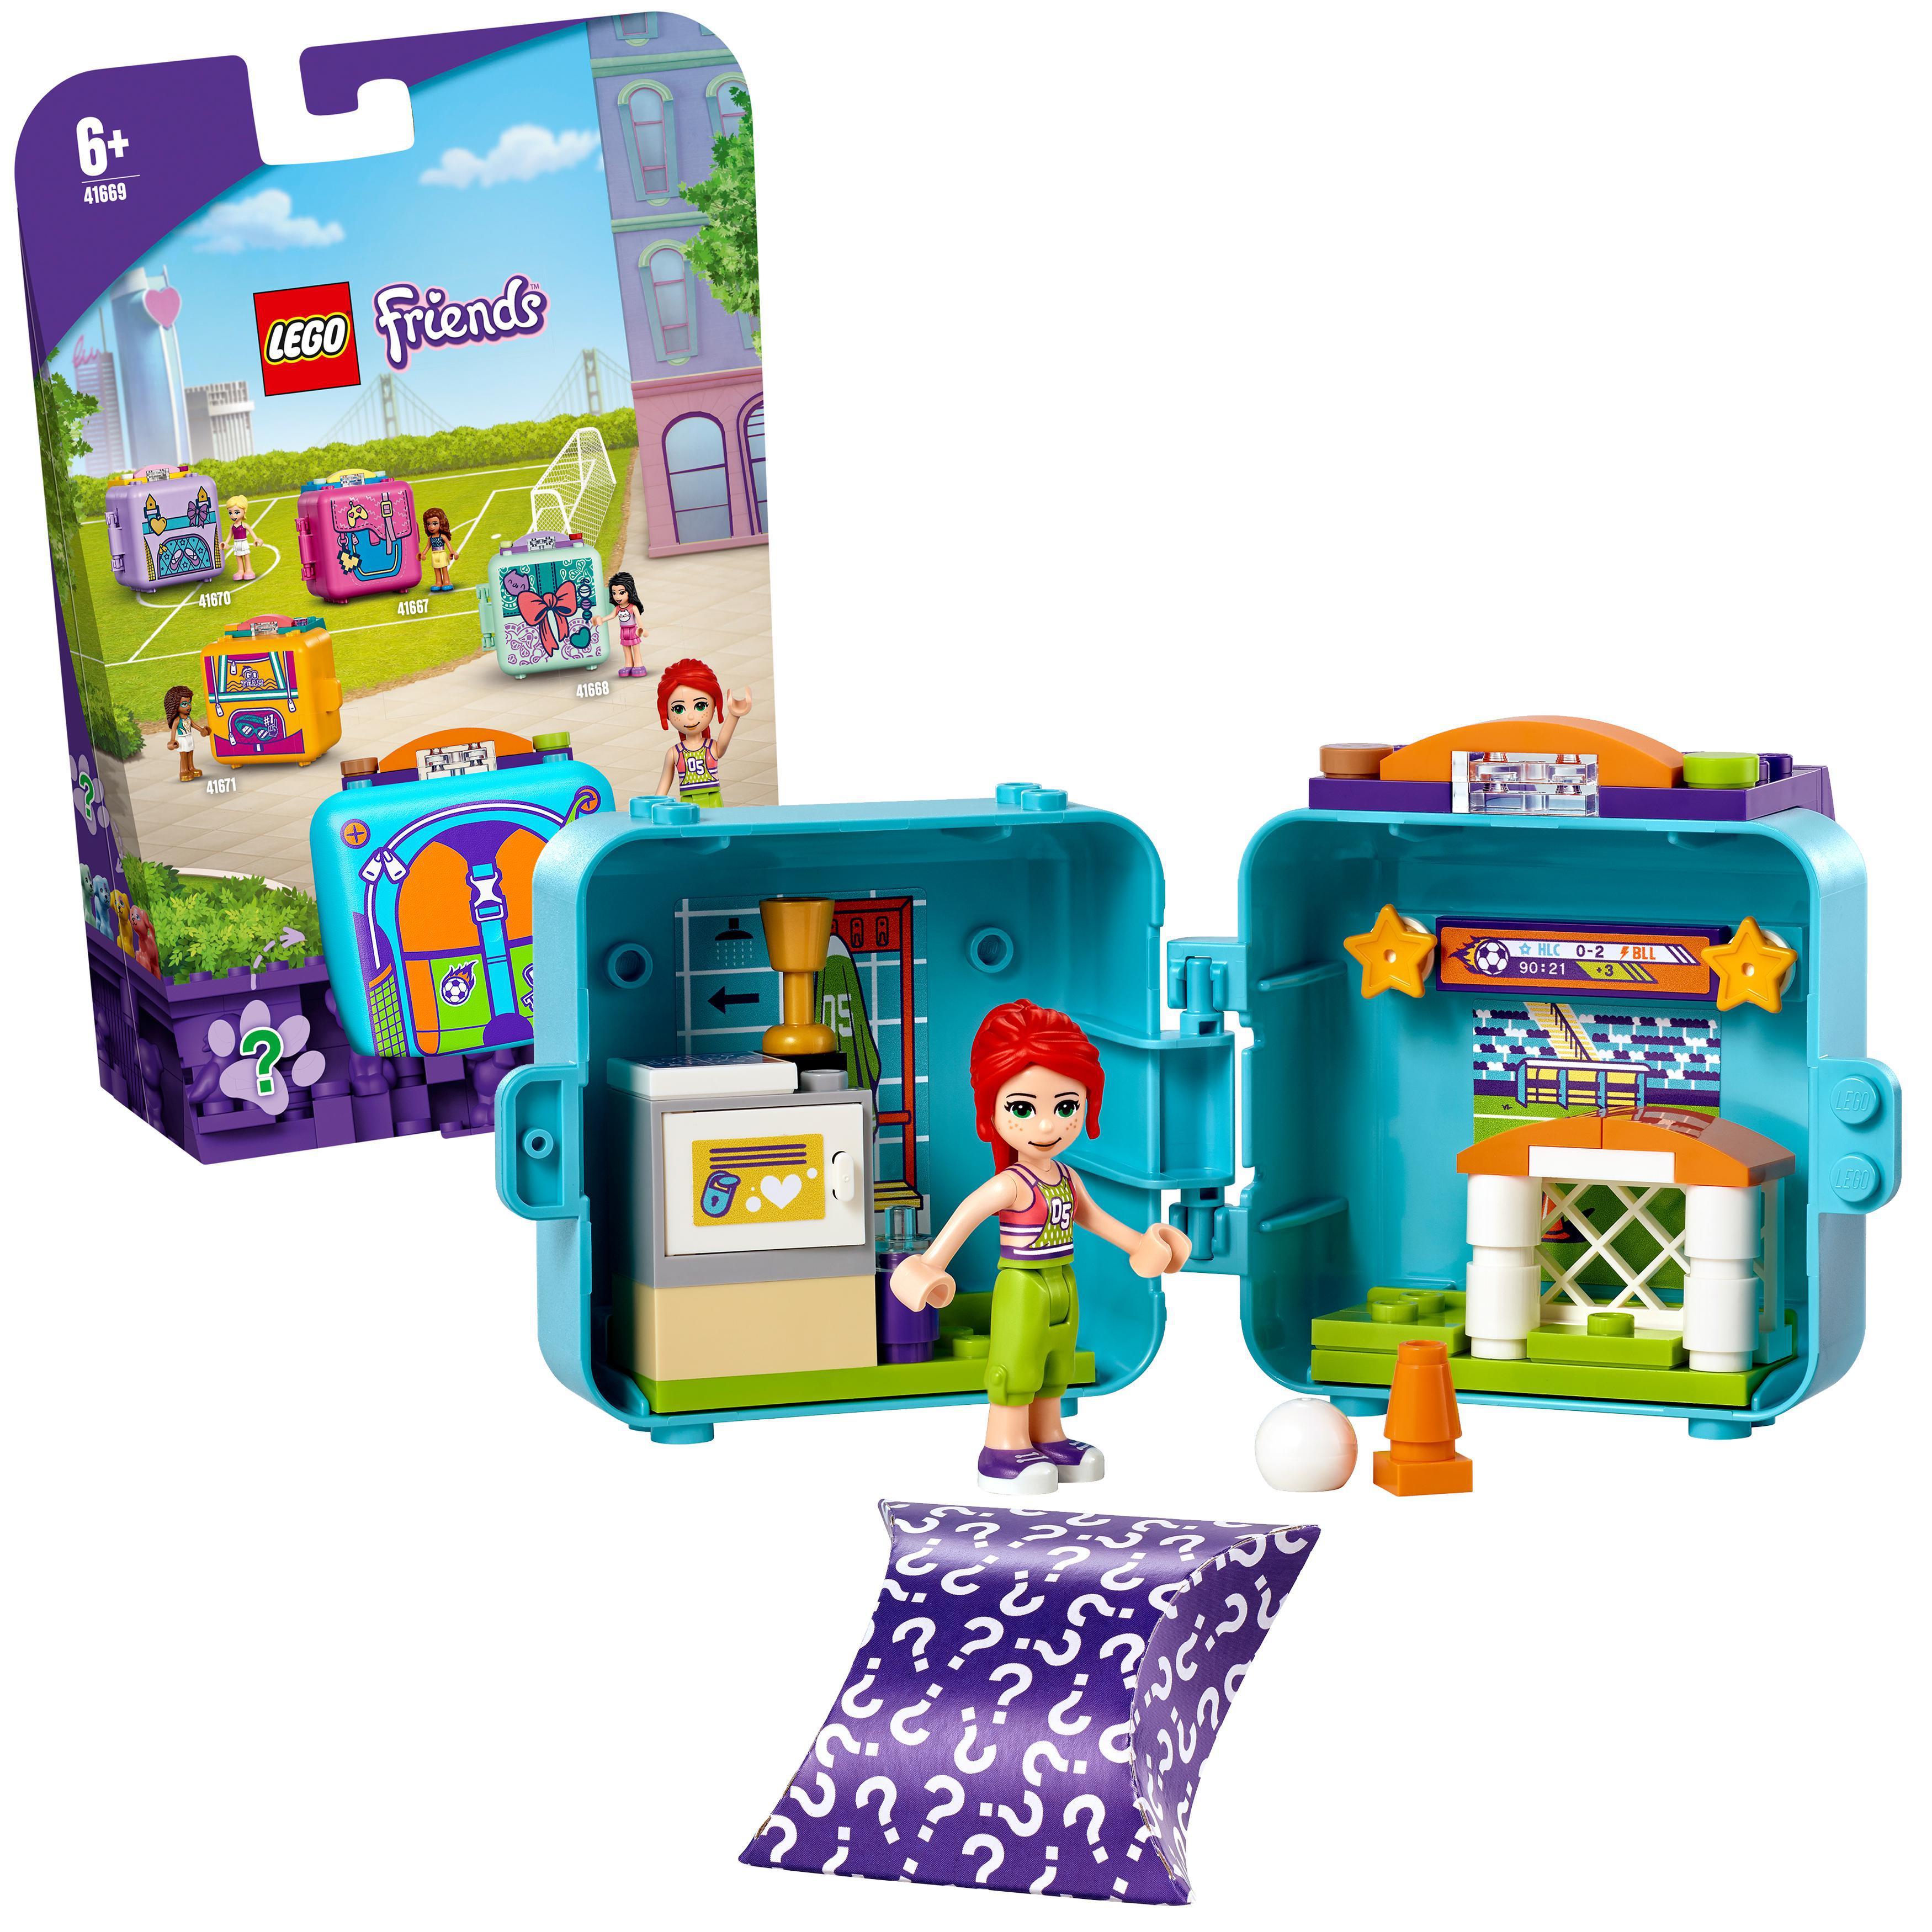 LEGO Friends - Mia's Soccer Cube (41669)